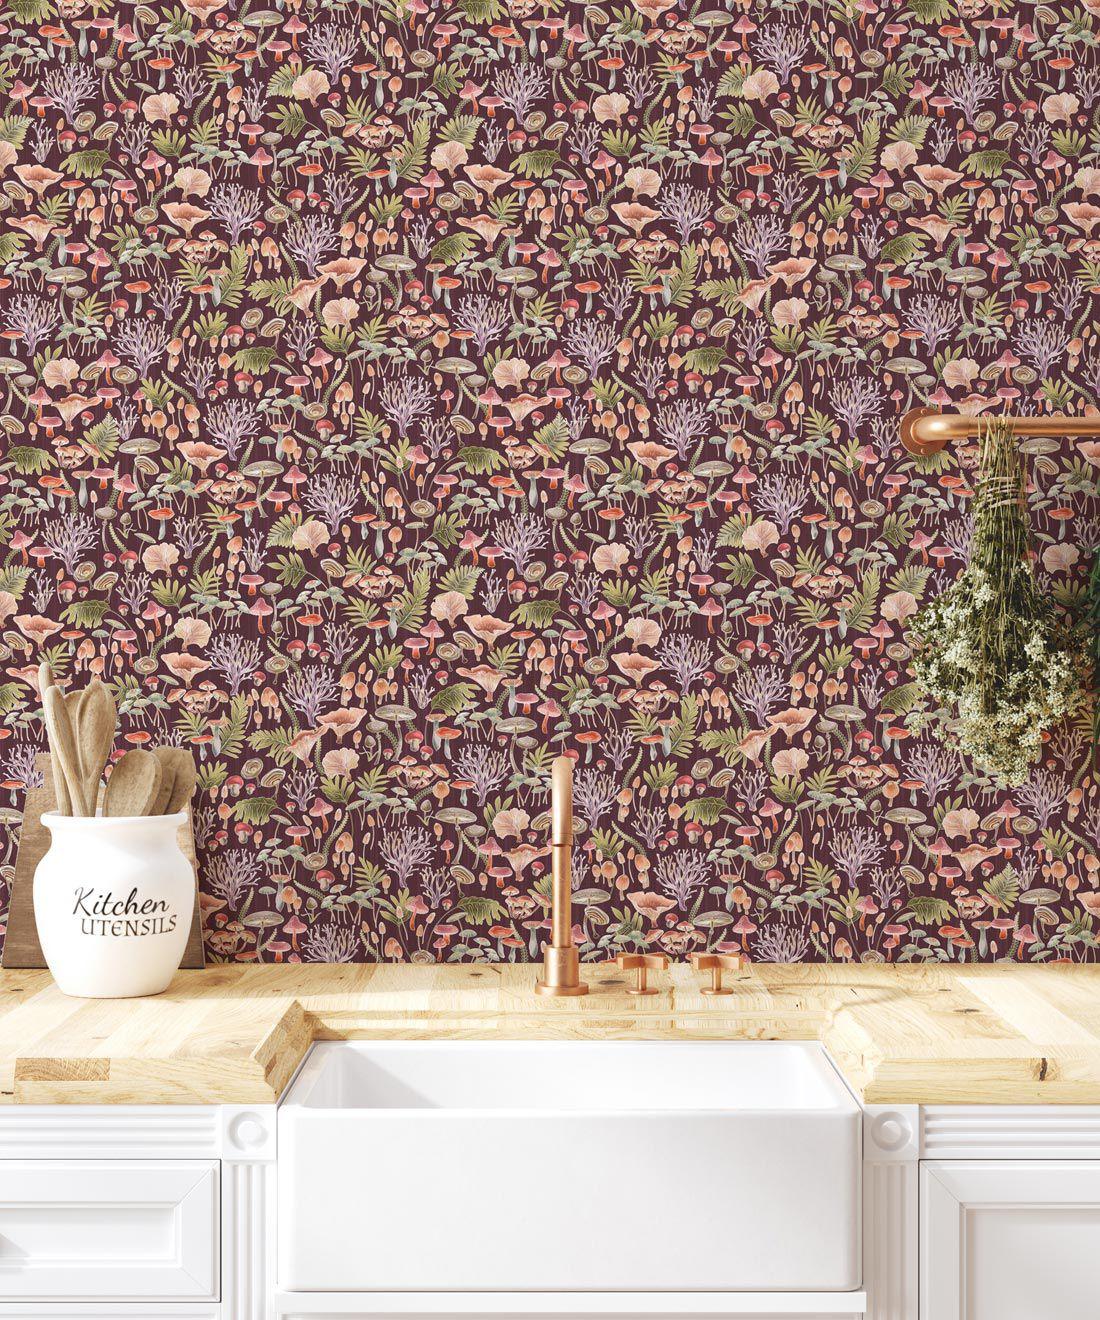 Fungi Wallpaper • Eloise Short • Vintage Floral Wallpaper •Granny Chic Wallpaper • Grandmillennial Style Wallpaper •Wine •Insitu